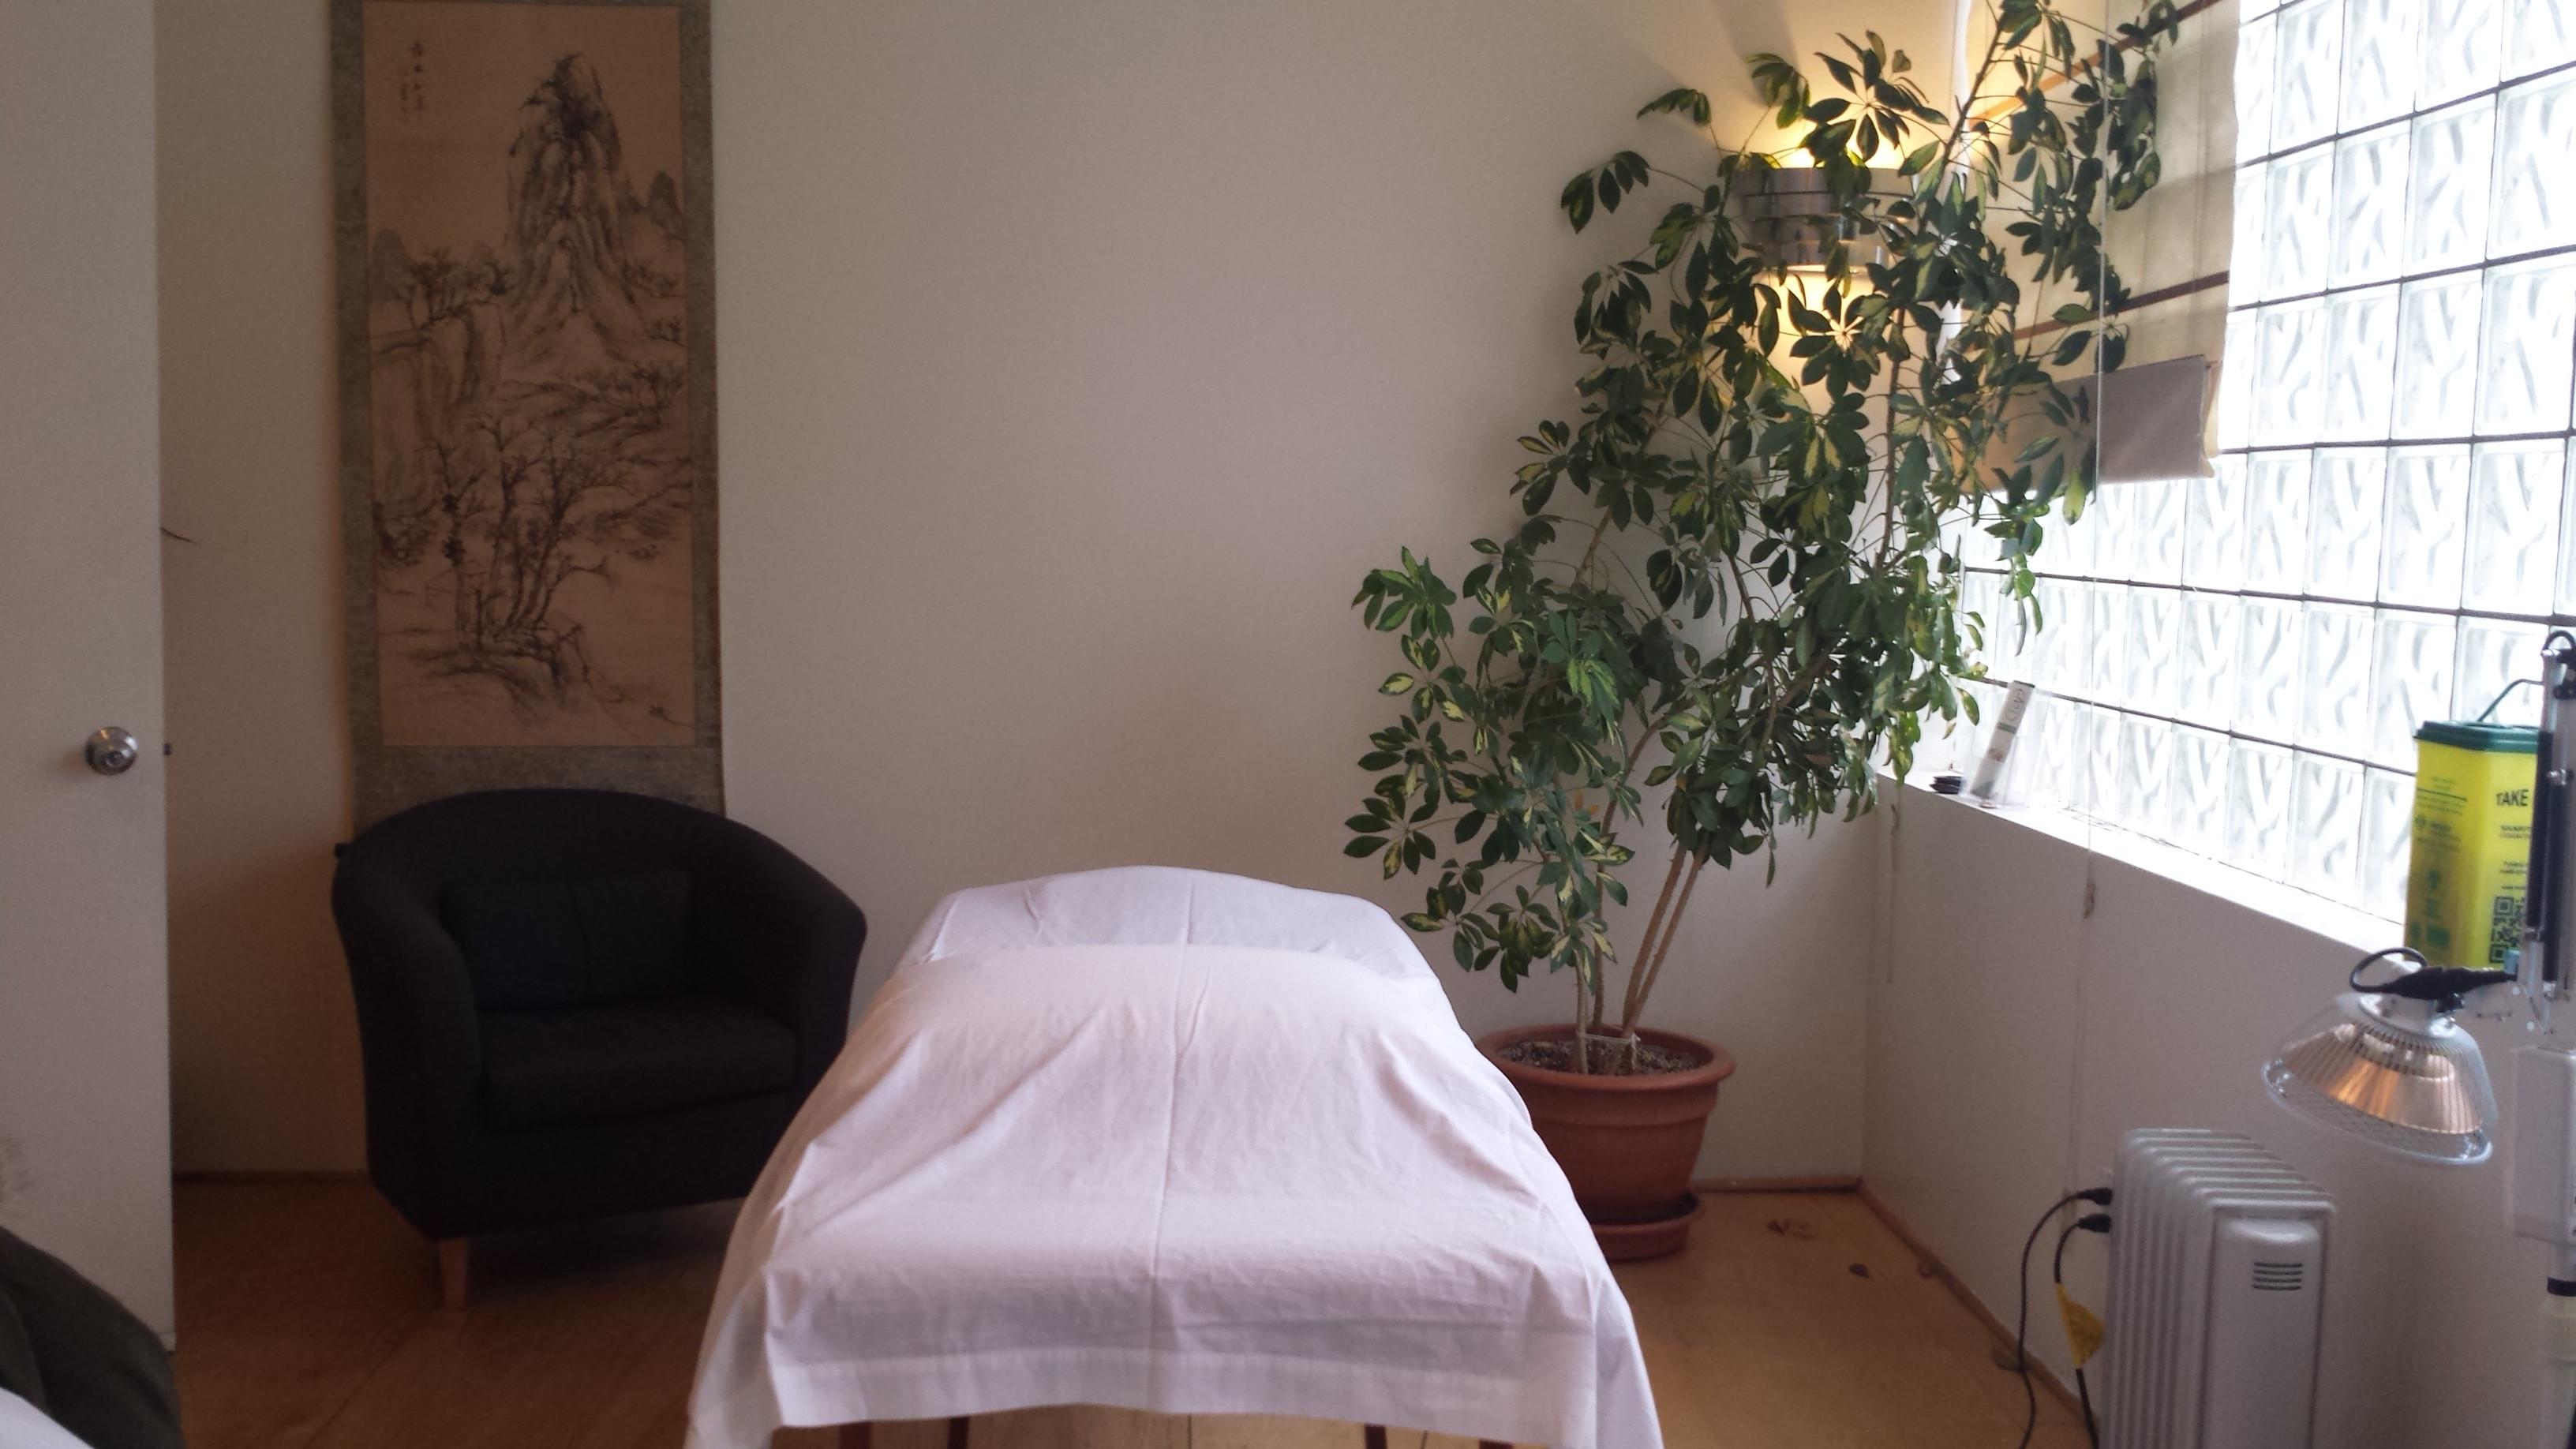 Acupuncture Treatment 60 min